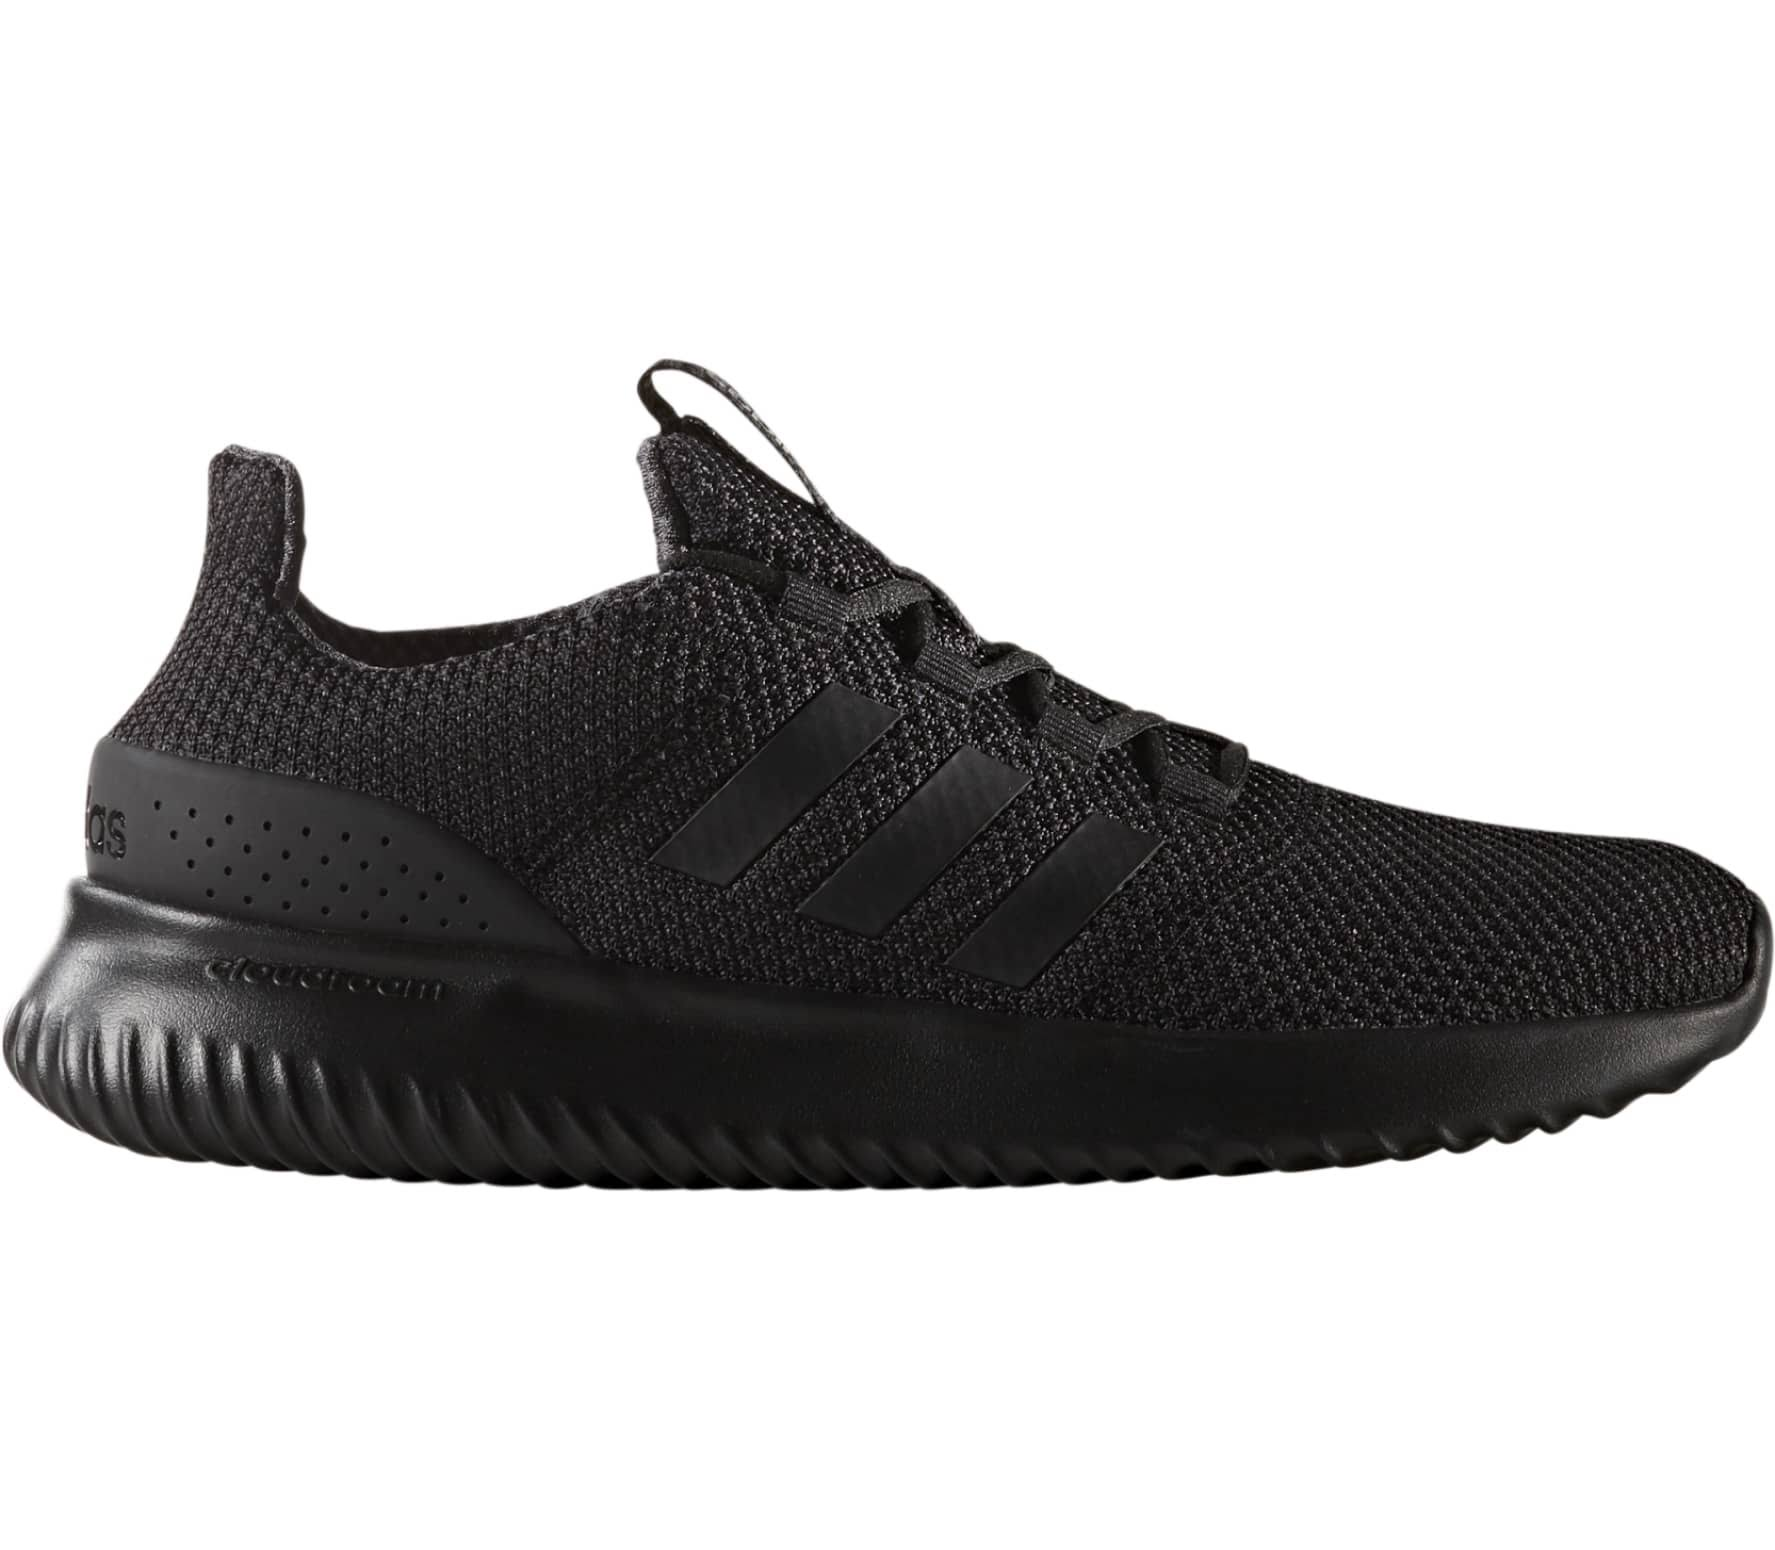 Adidas Sneakers Coreblack Ultimate coreblack utilityblack Zwart Cloudfoam rdxoeBC